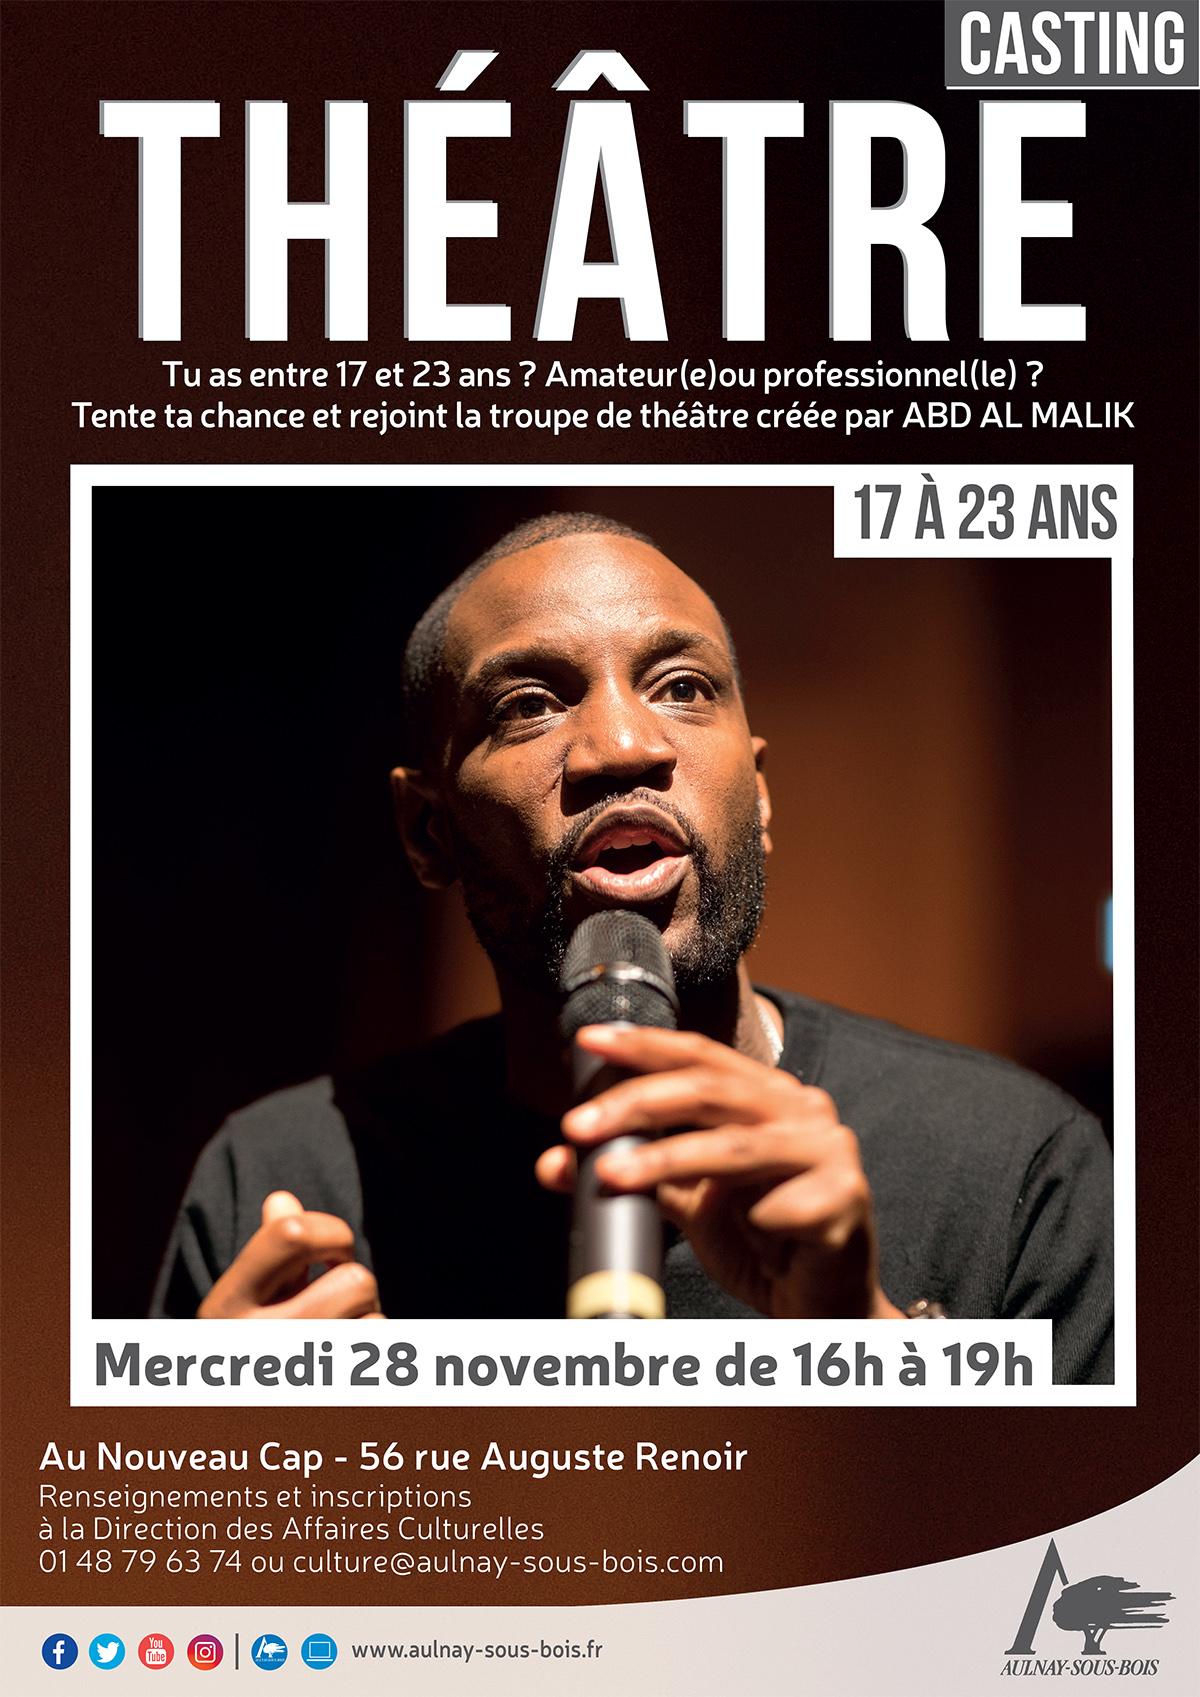 second casting théâtre d'Abdelmalik